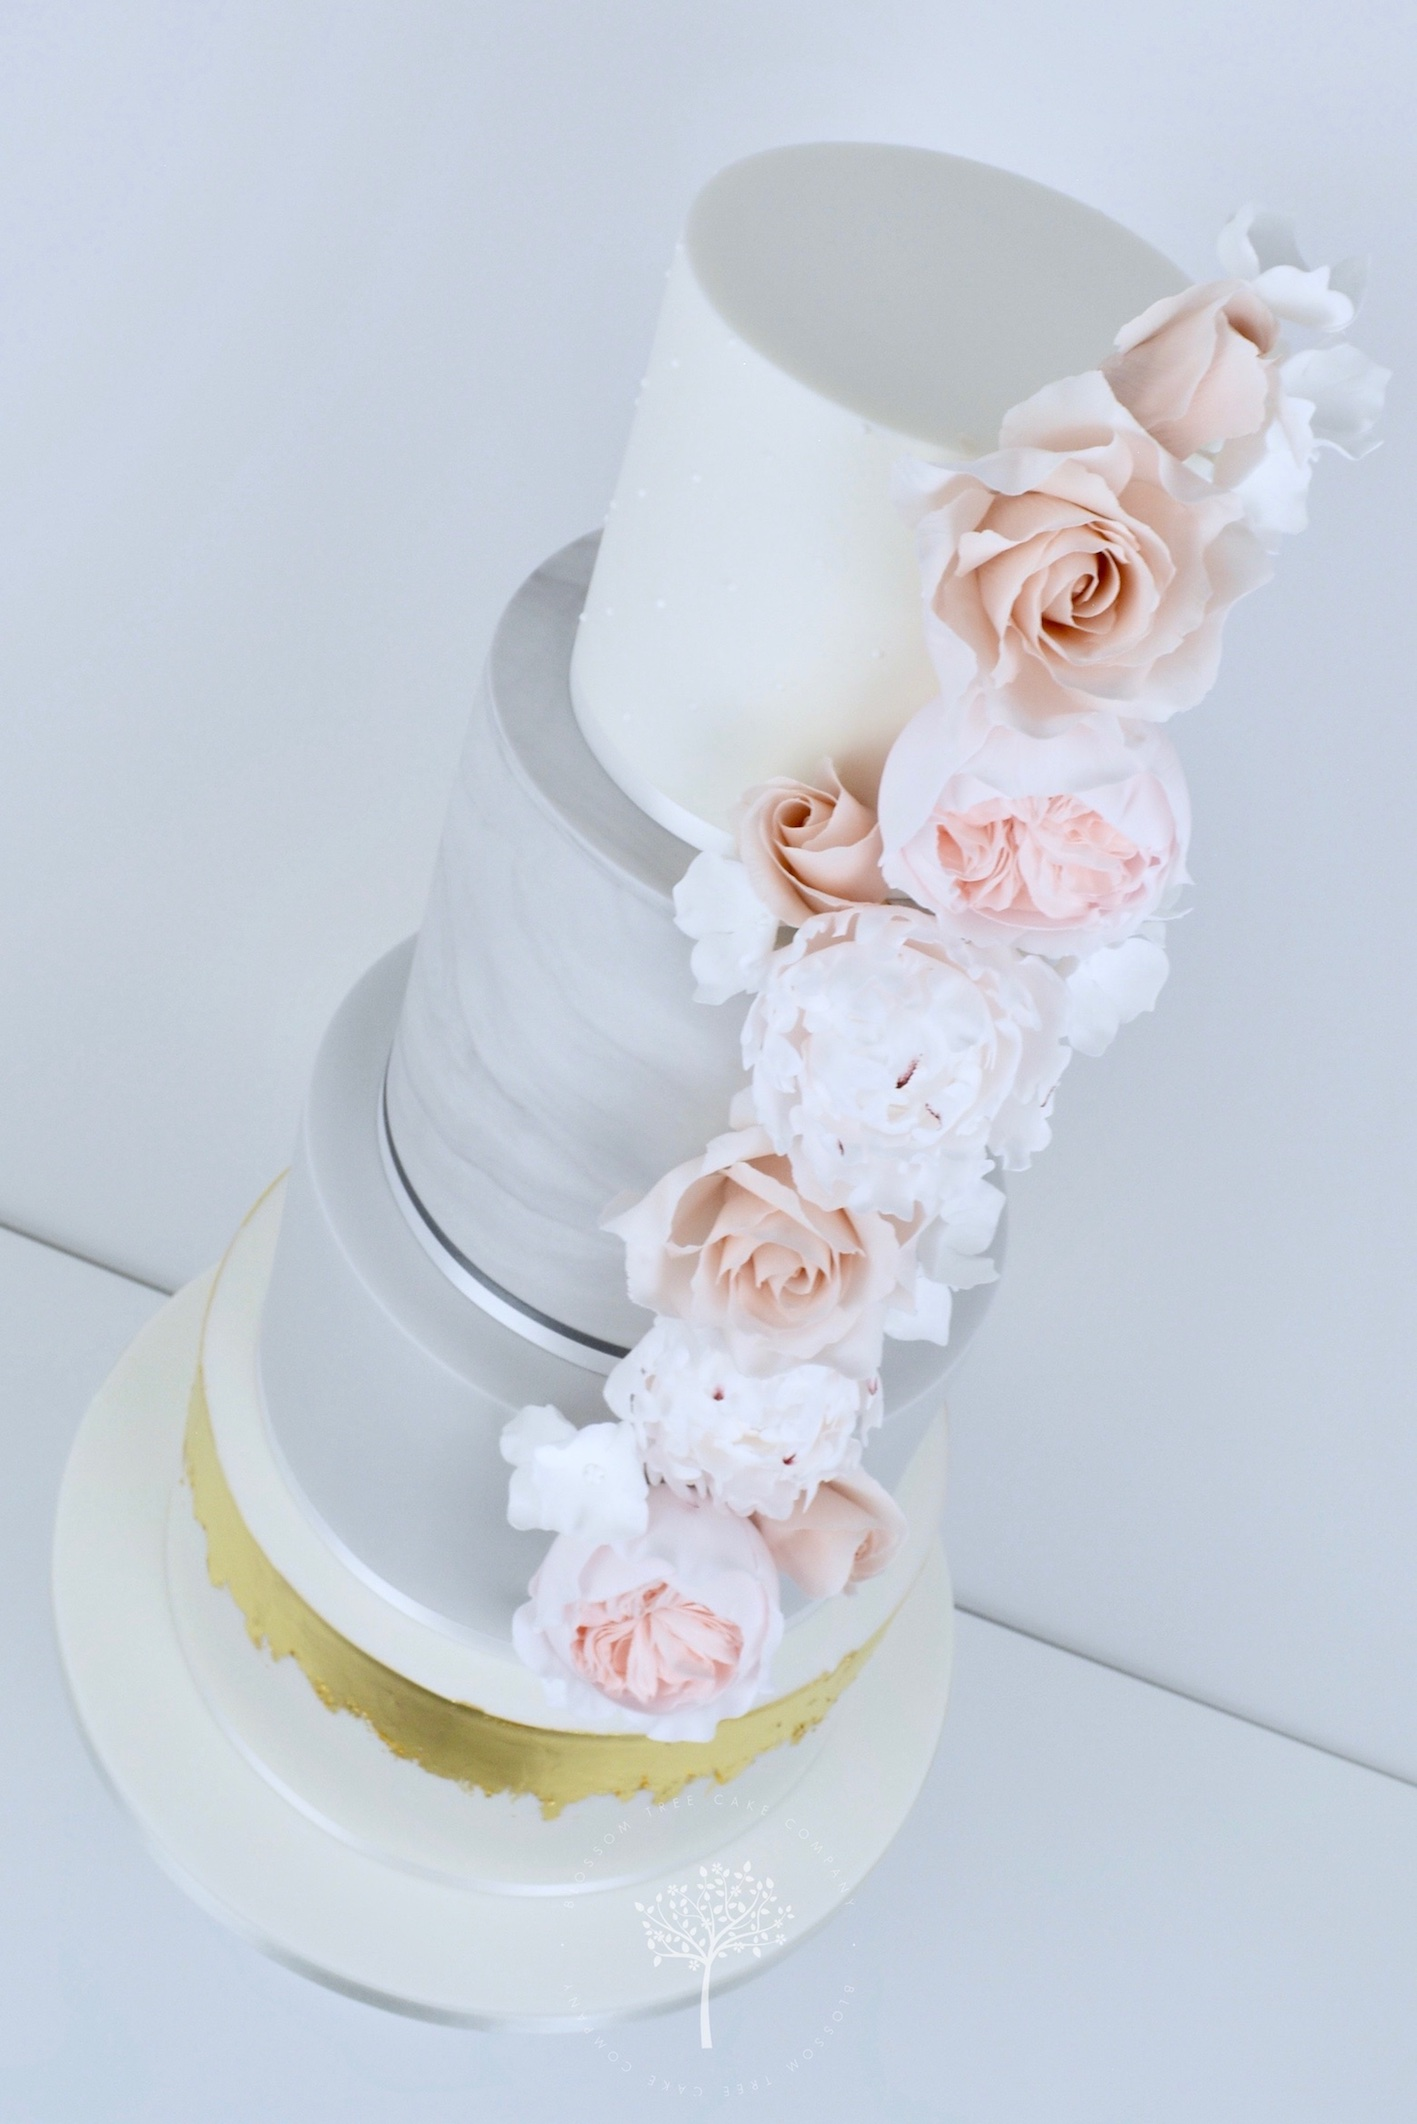 Nude Roses & Peony wedding cake by Blossom Tree Cake Company Harrogate North Yorkshire - angle.jpg